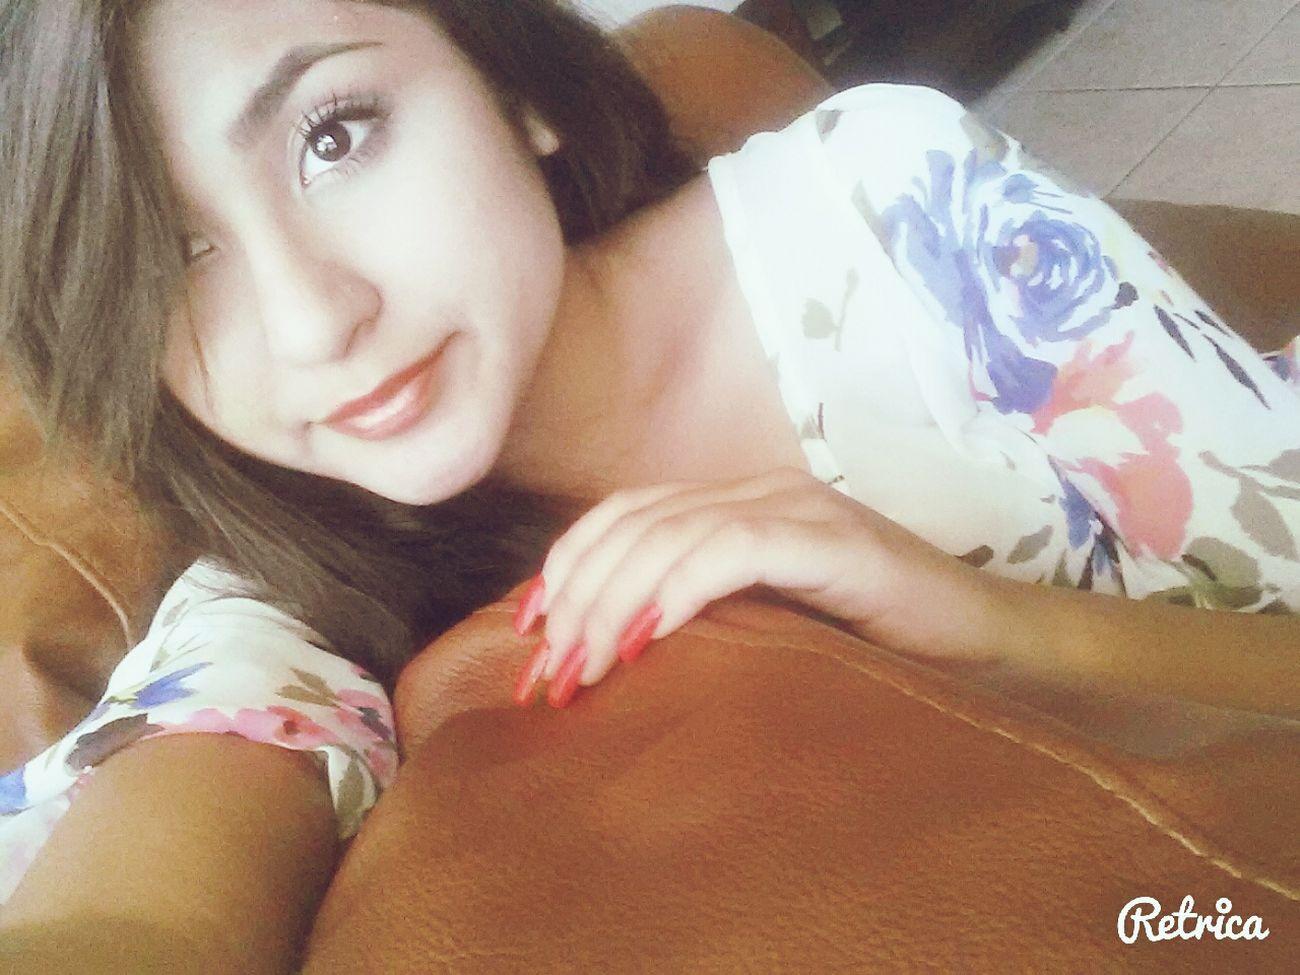 IG: yo_itsmaria /kik: mariavazquez246 Follow4follow Follow ;) Like :) Tbt ❤